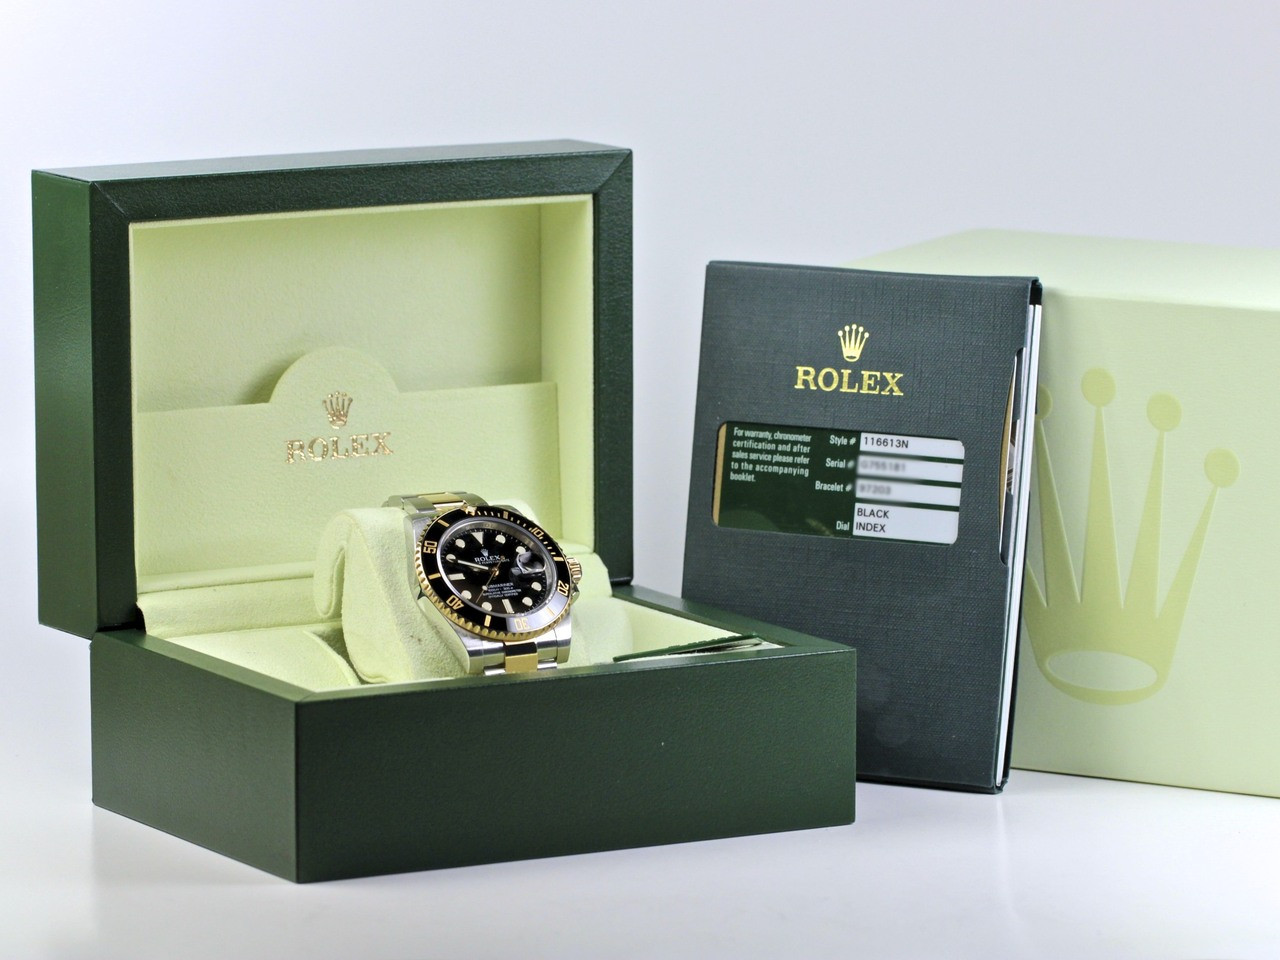 Complete - Rolex Watch Submariner Steel and Gold 116613 - www. Legendoftime.com - Chicago Watch Center